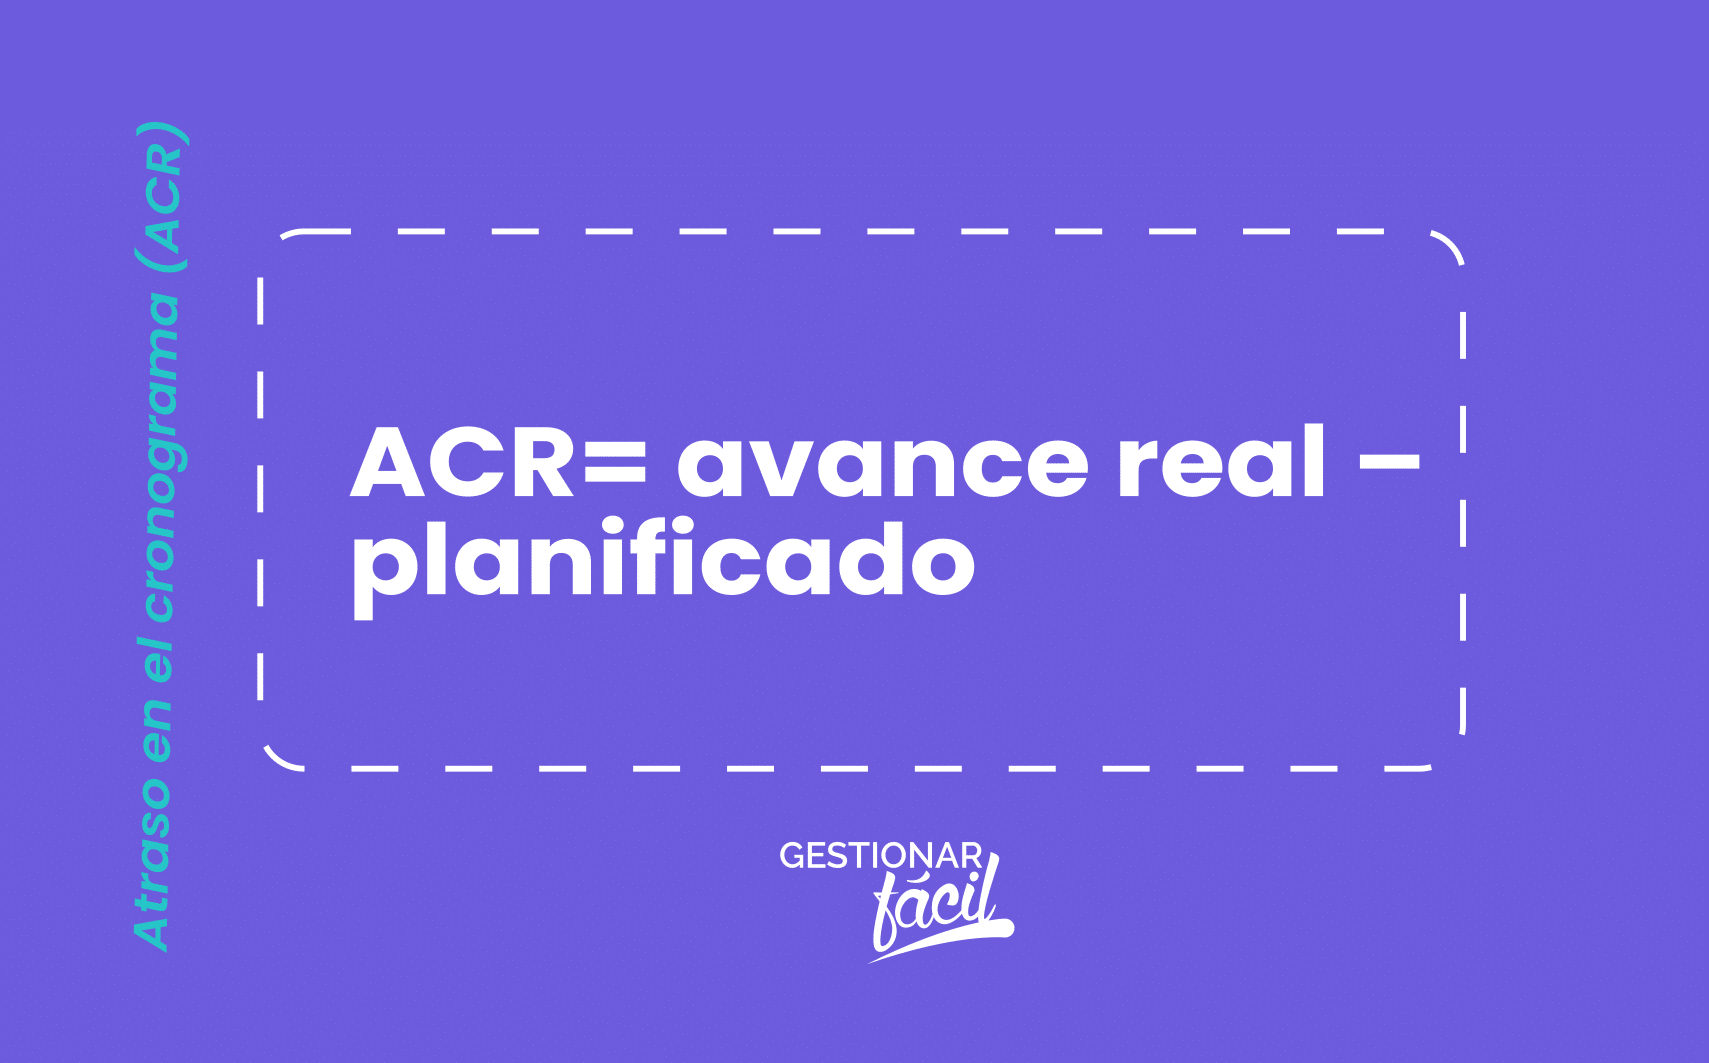 ACR= avance real – planificado  (días, semanas, meses);